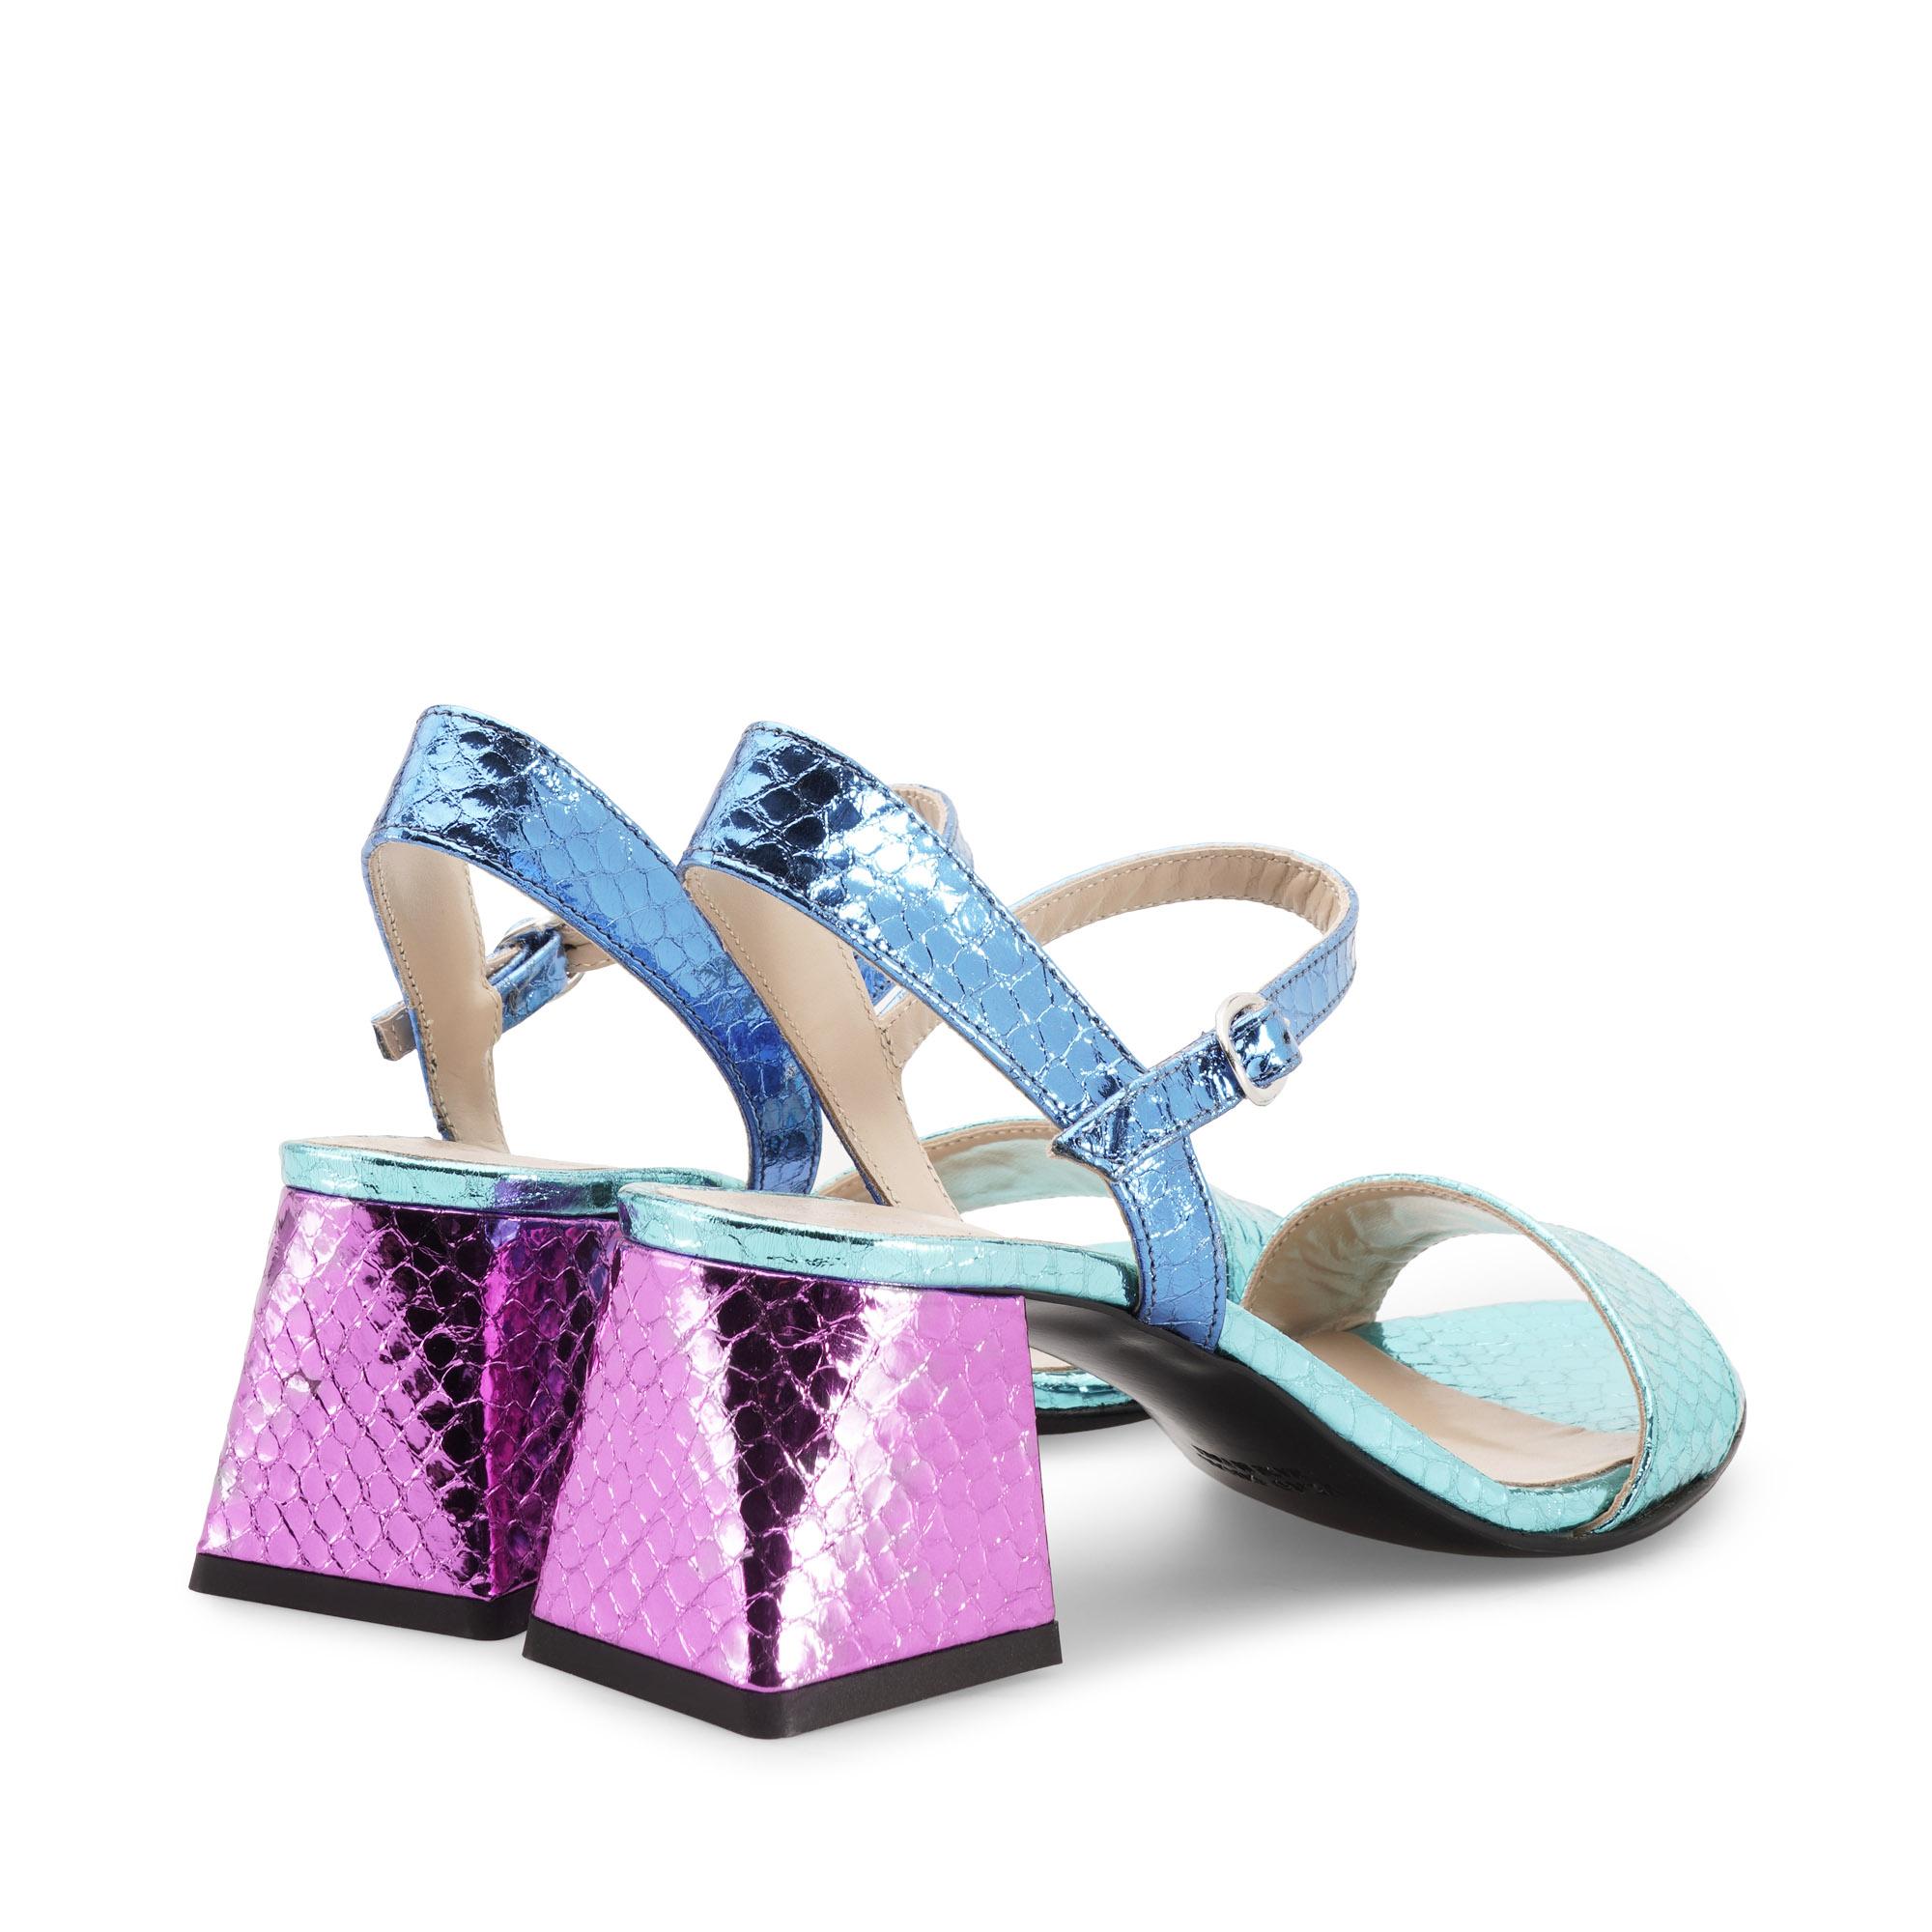 sandalo-donna-laminato-azzurro-blu-fuxia-emanuela-passeri-heels-shoes-spring-summer-2021